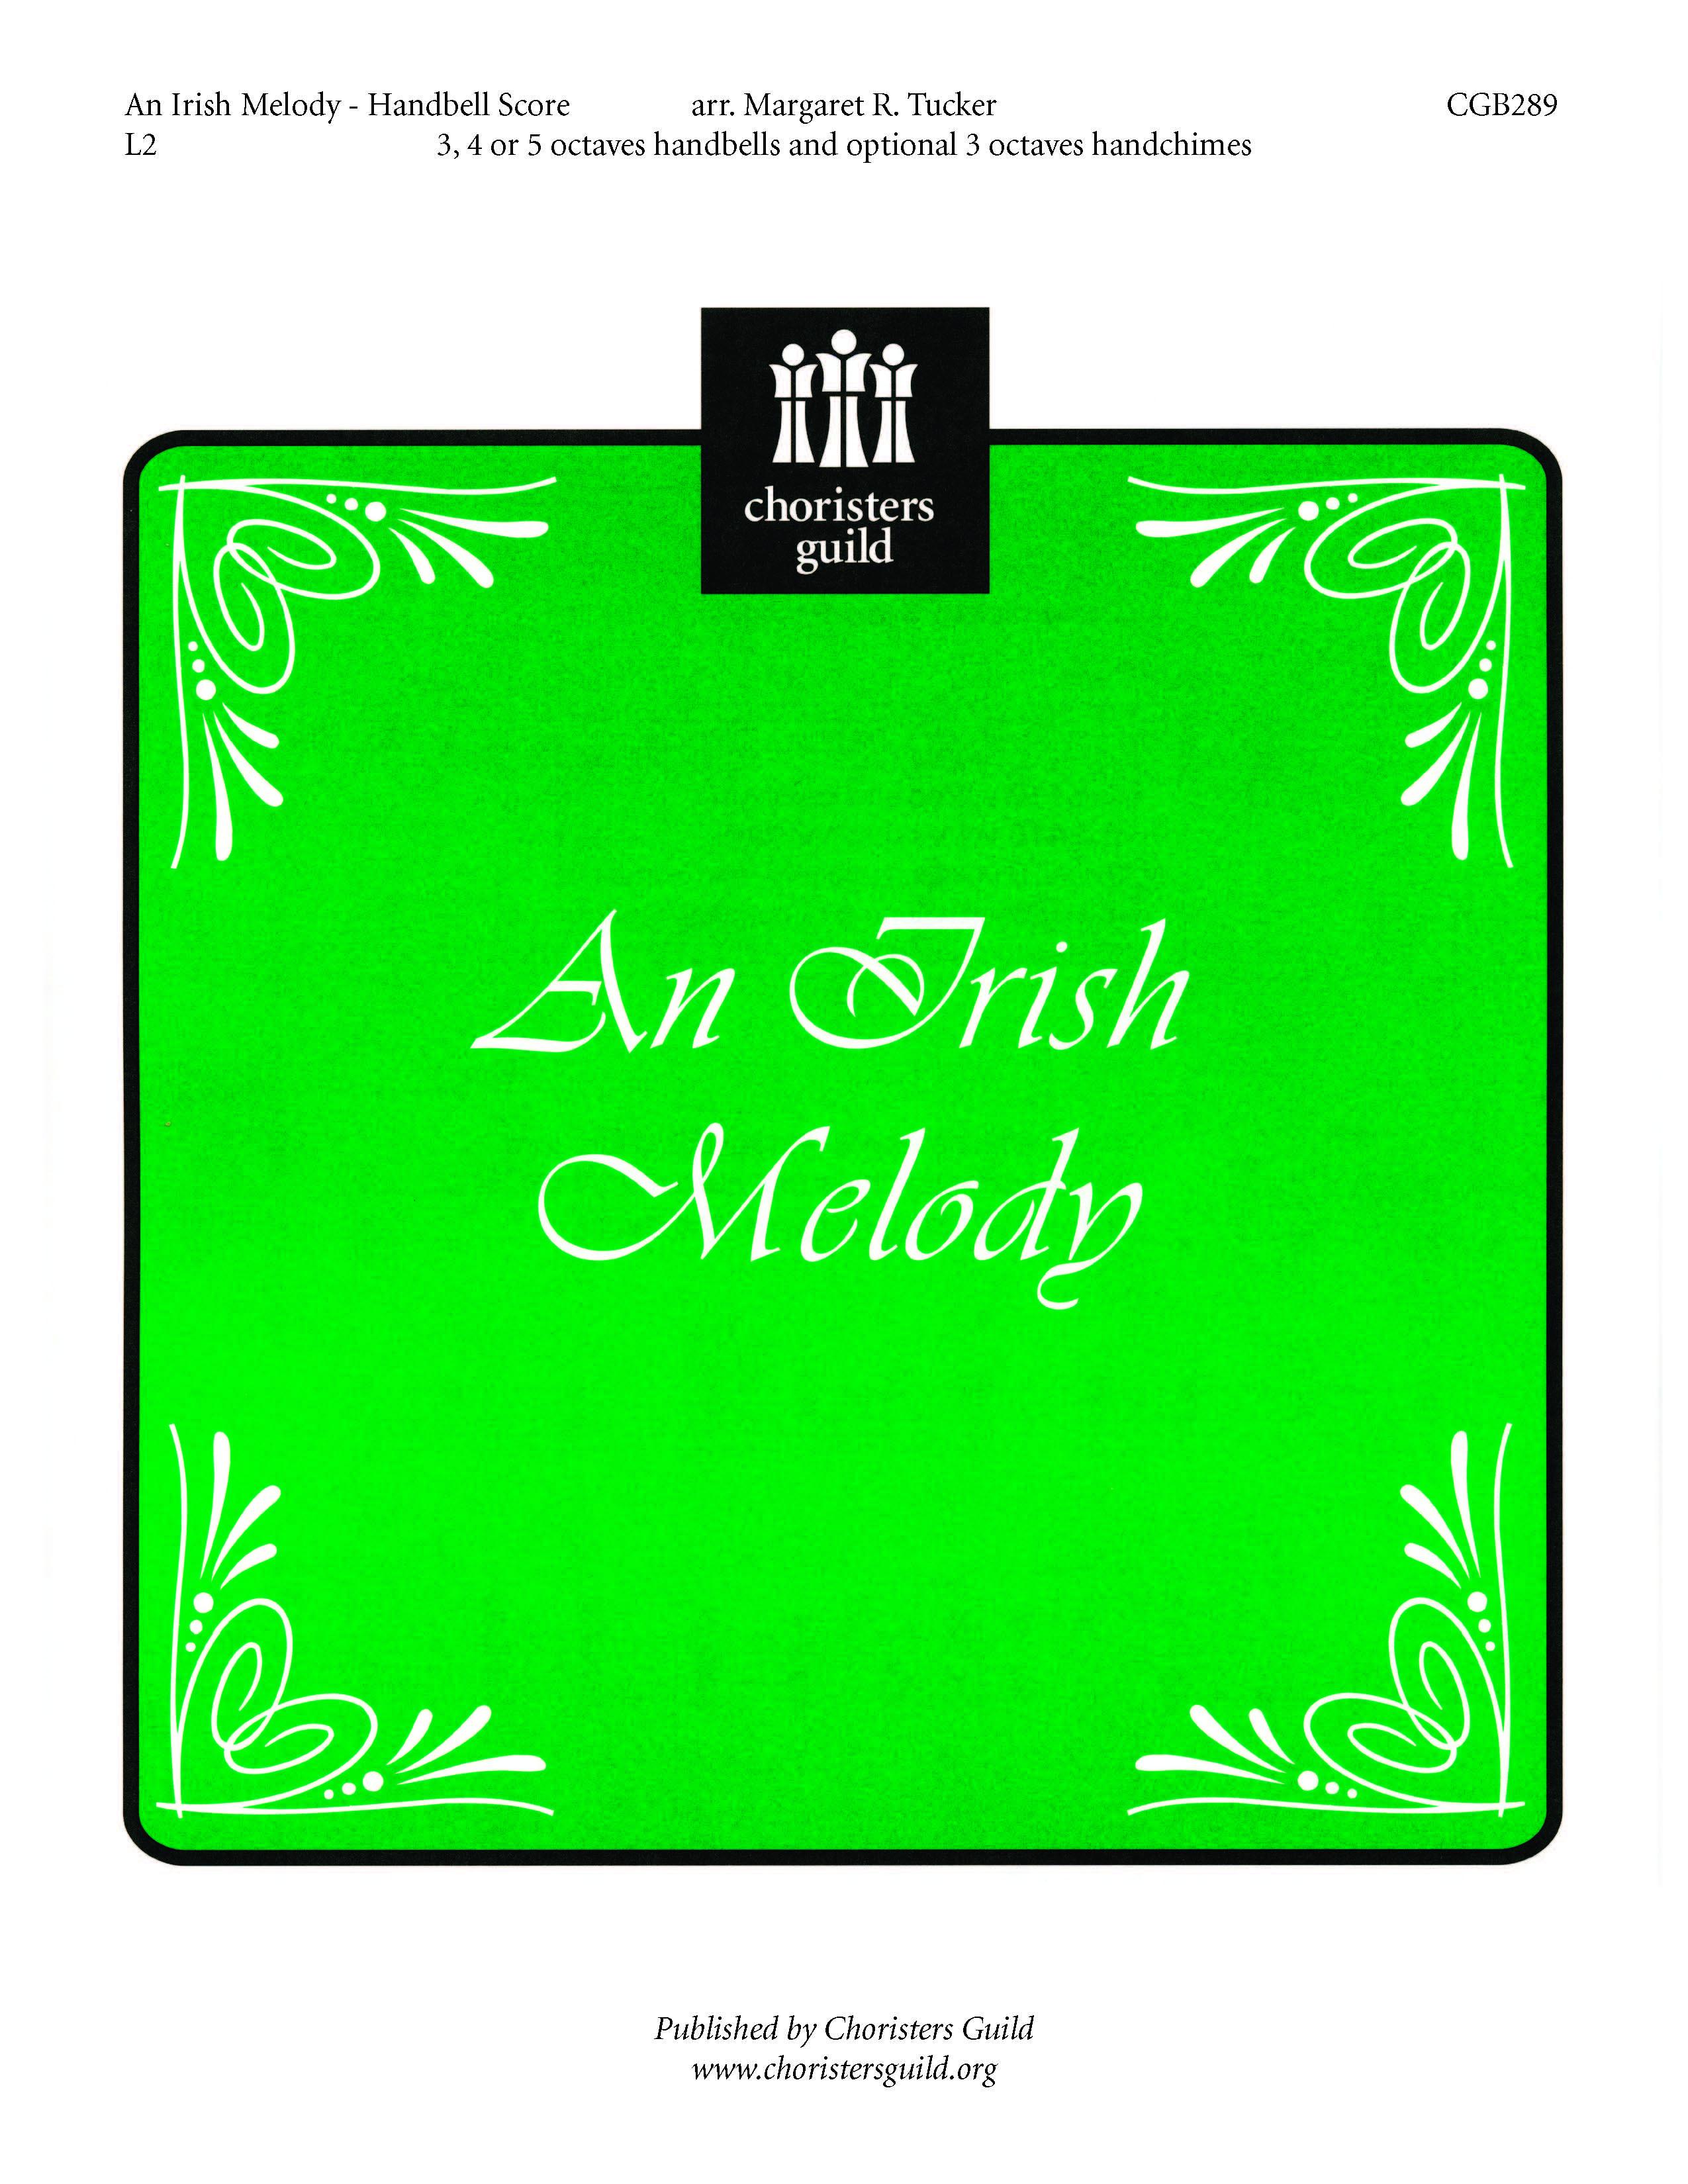 An Irish Melody (Handbell Score)